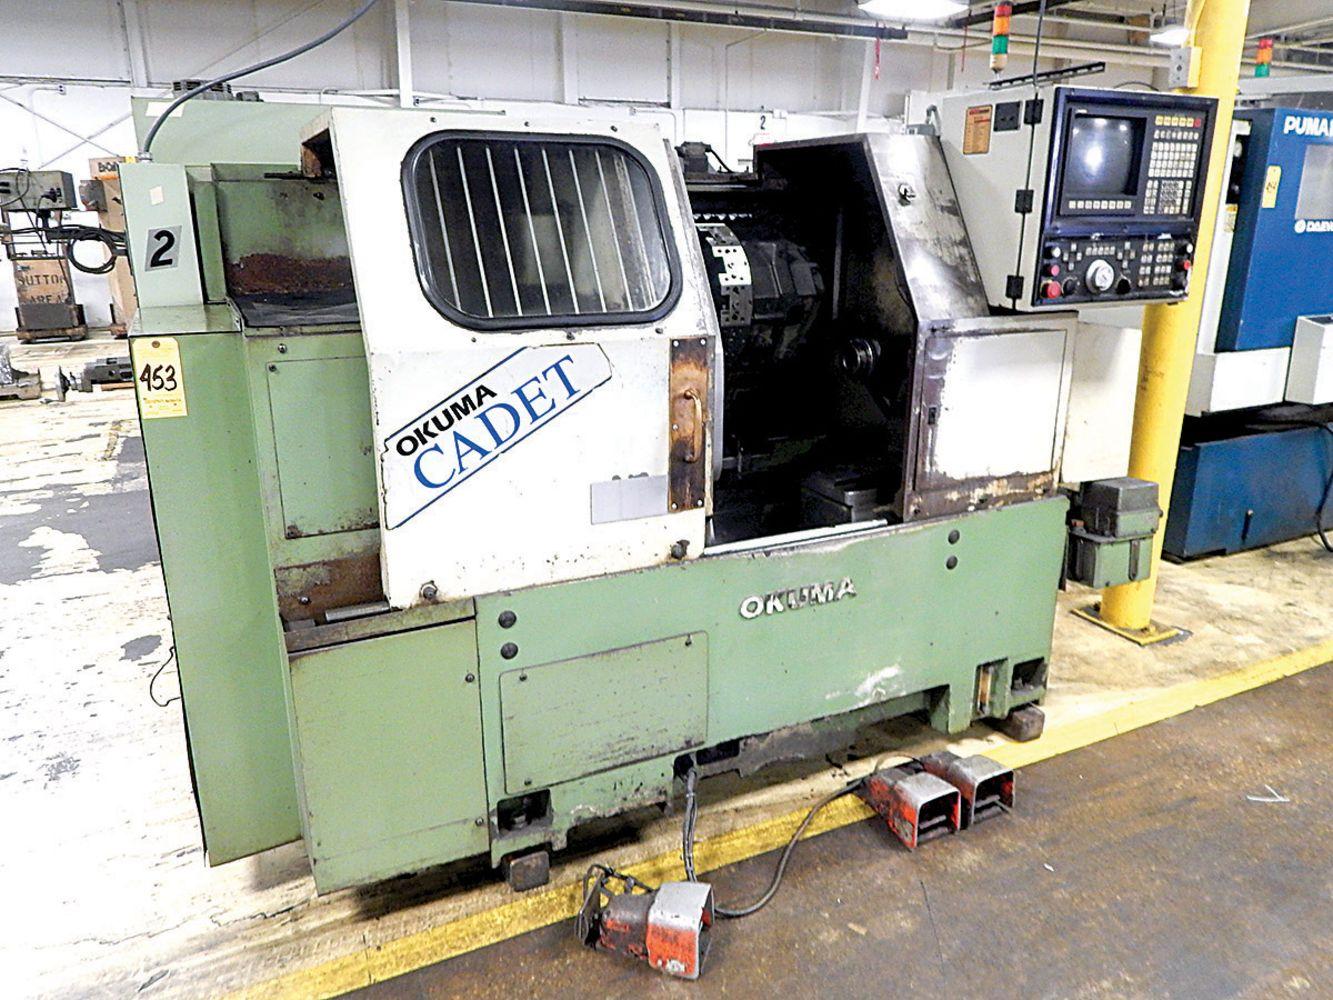 3 Locations – CNC Machinery, Fabricating, Duct Machinery